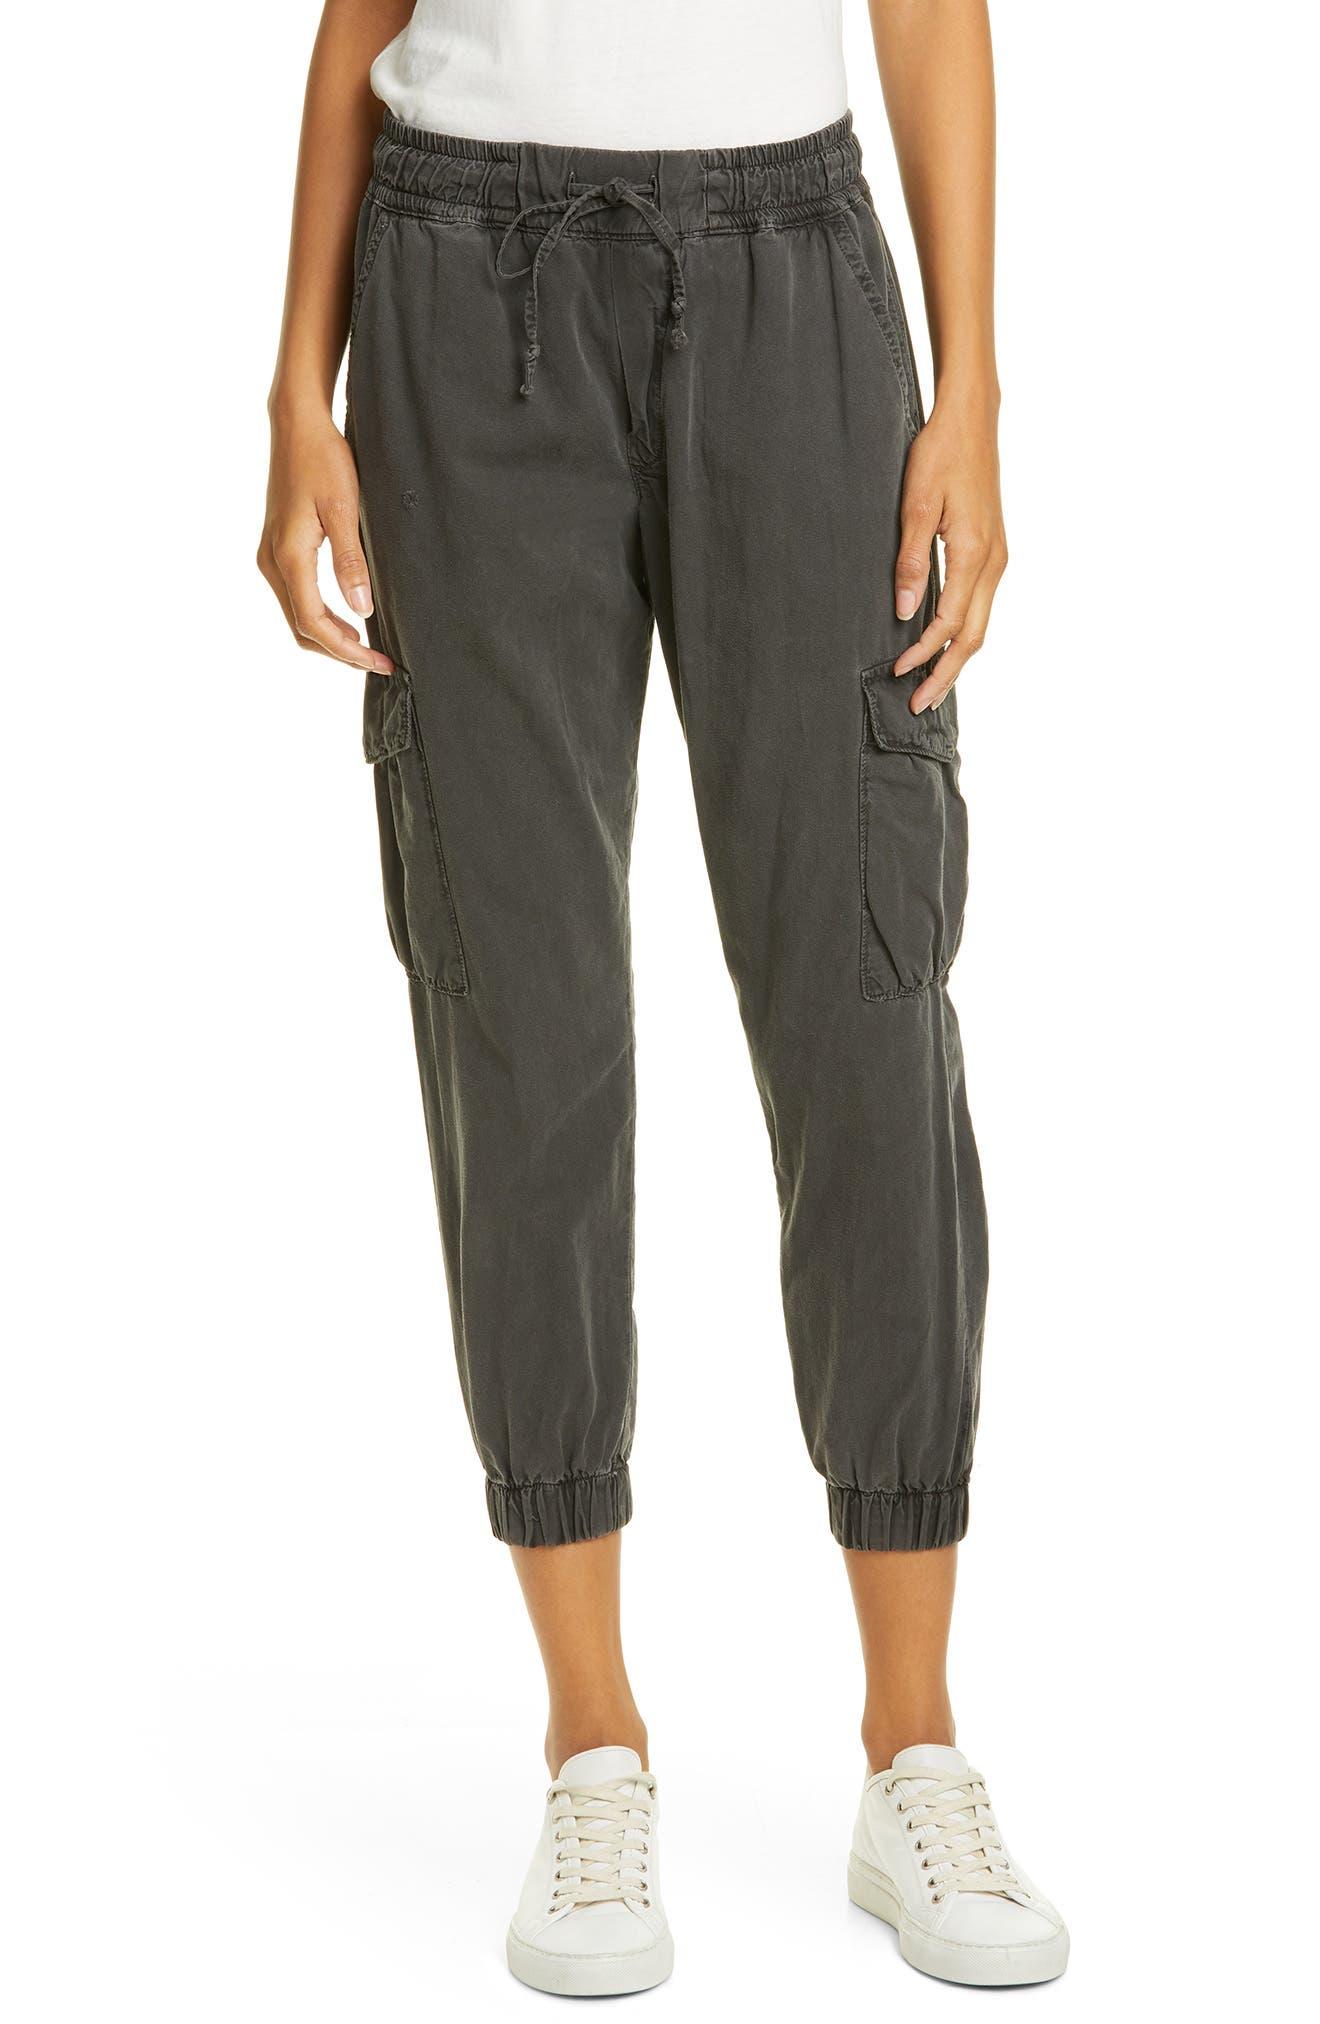 Nsf Clothing Johnny Cargo Jogger Pants, Black